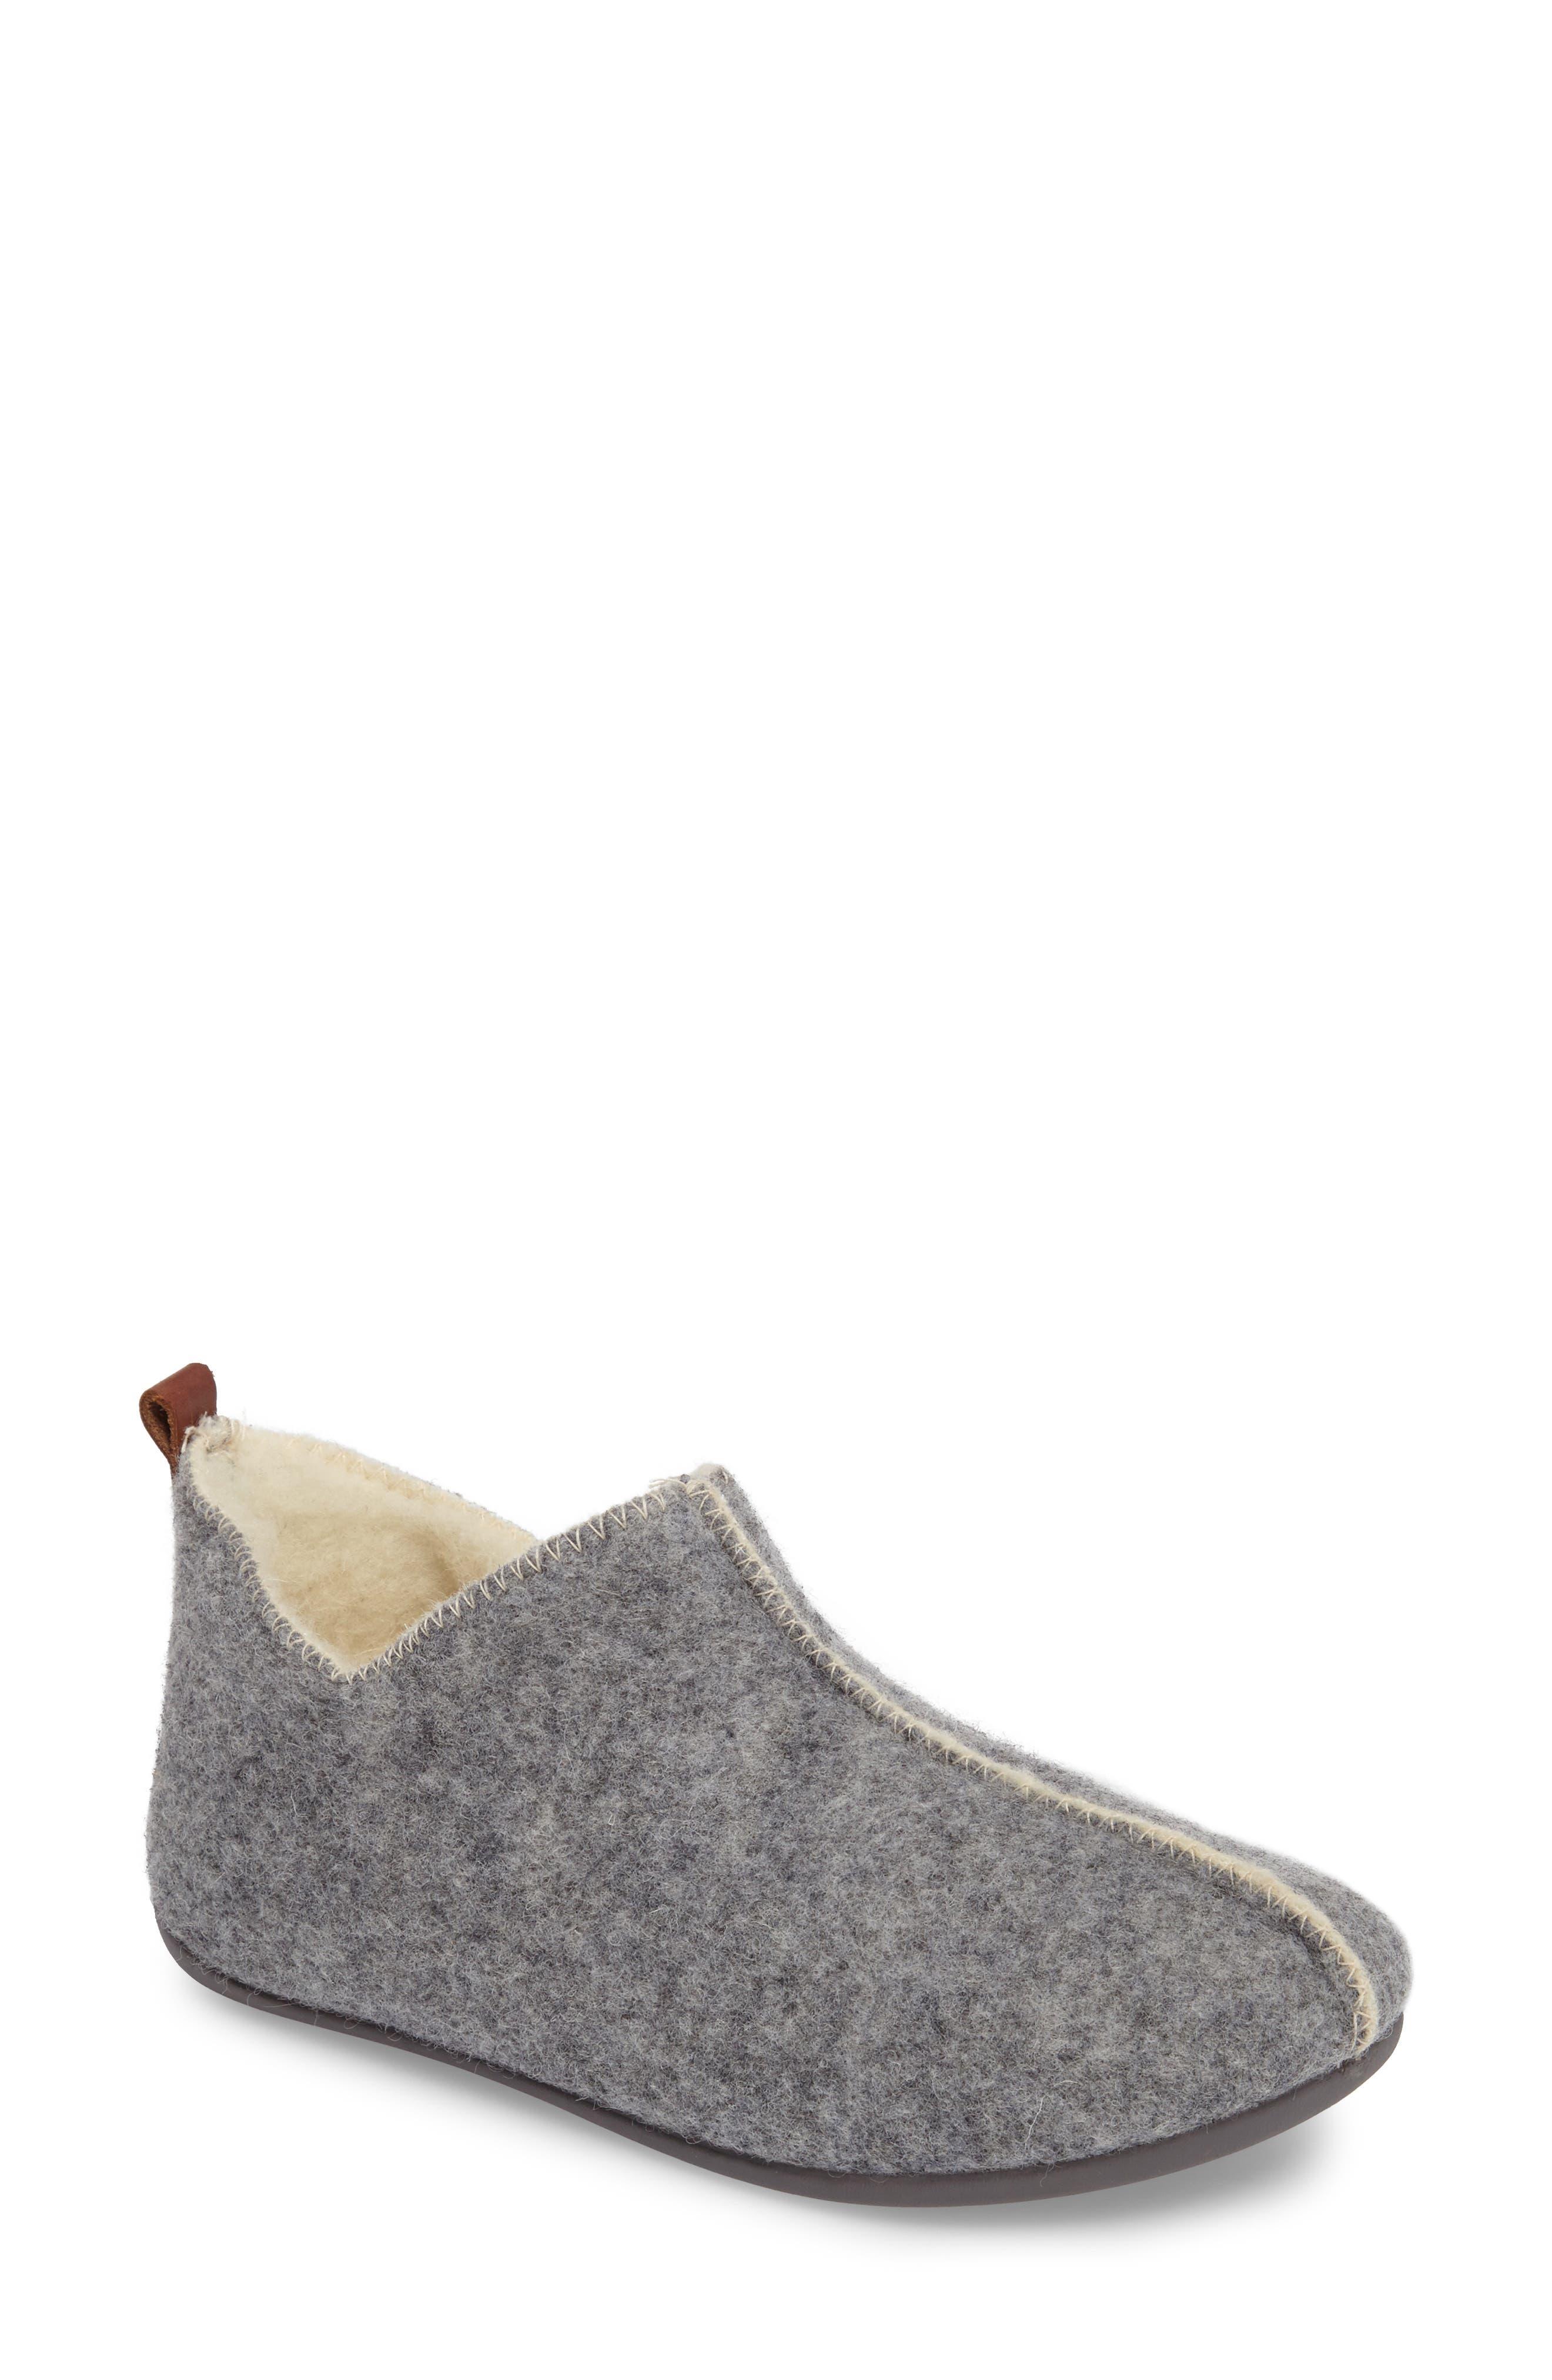 Lila Slipper,                         Main,                         color, Grey Fabric